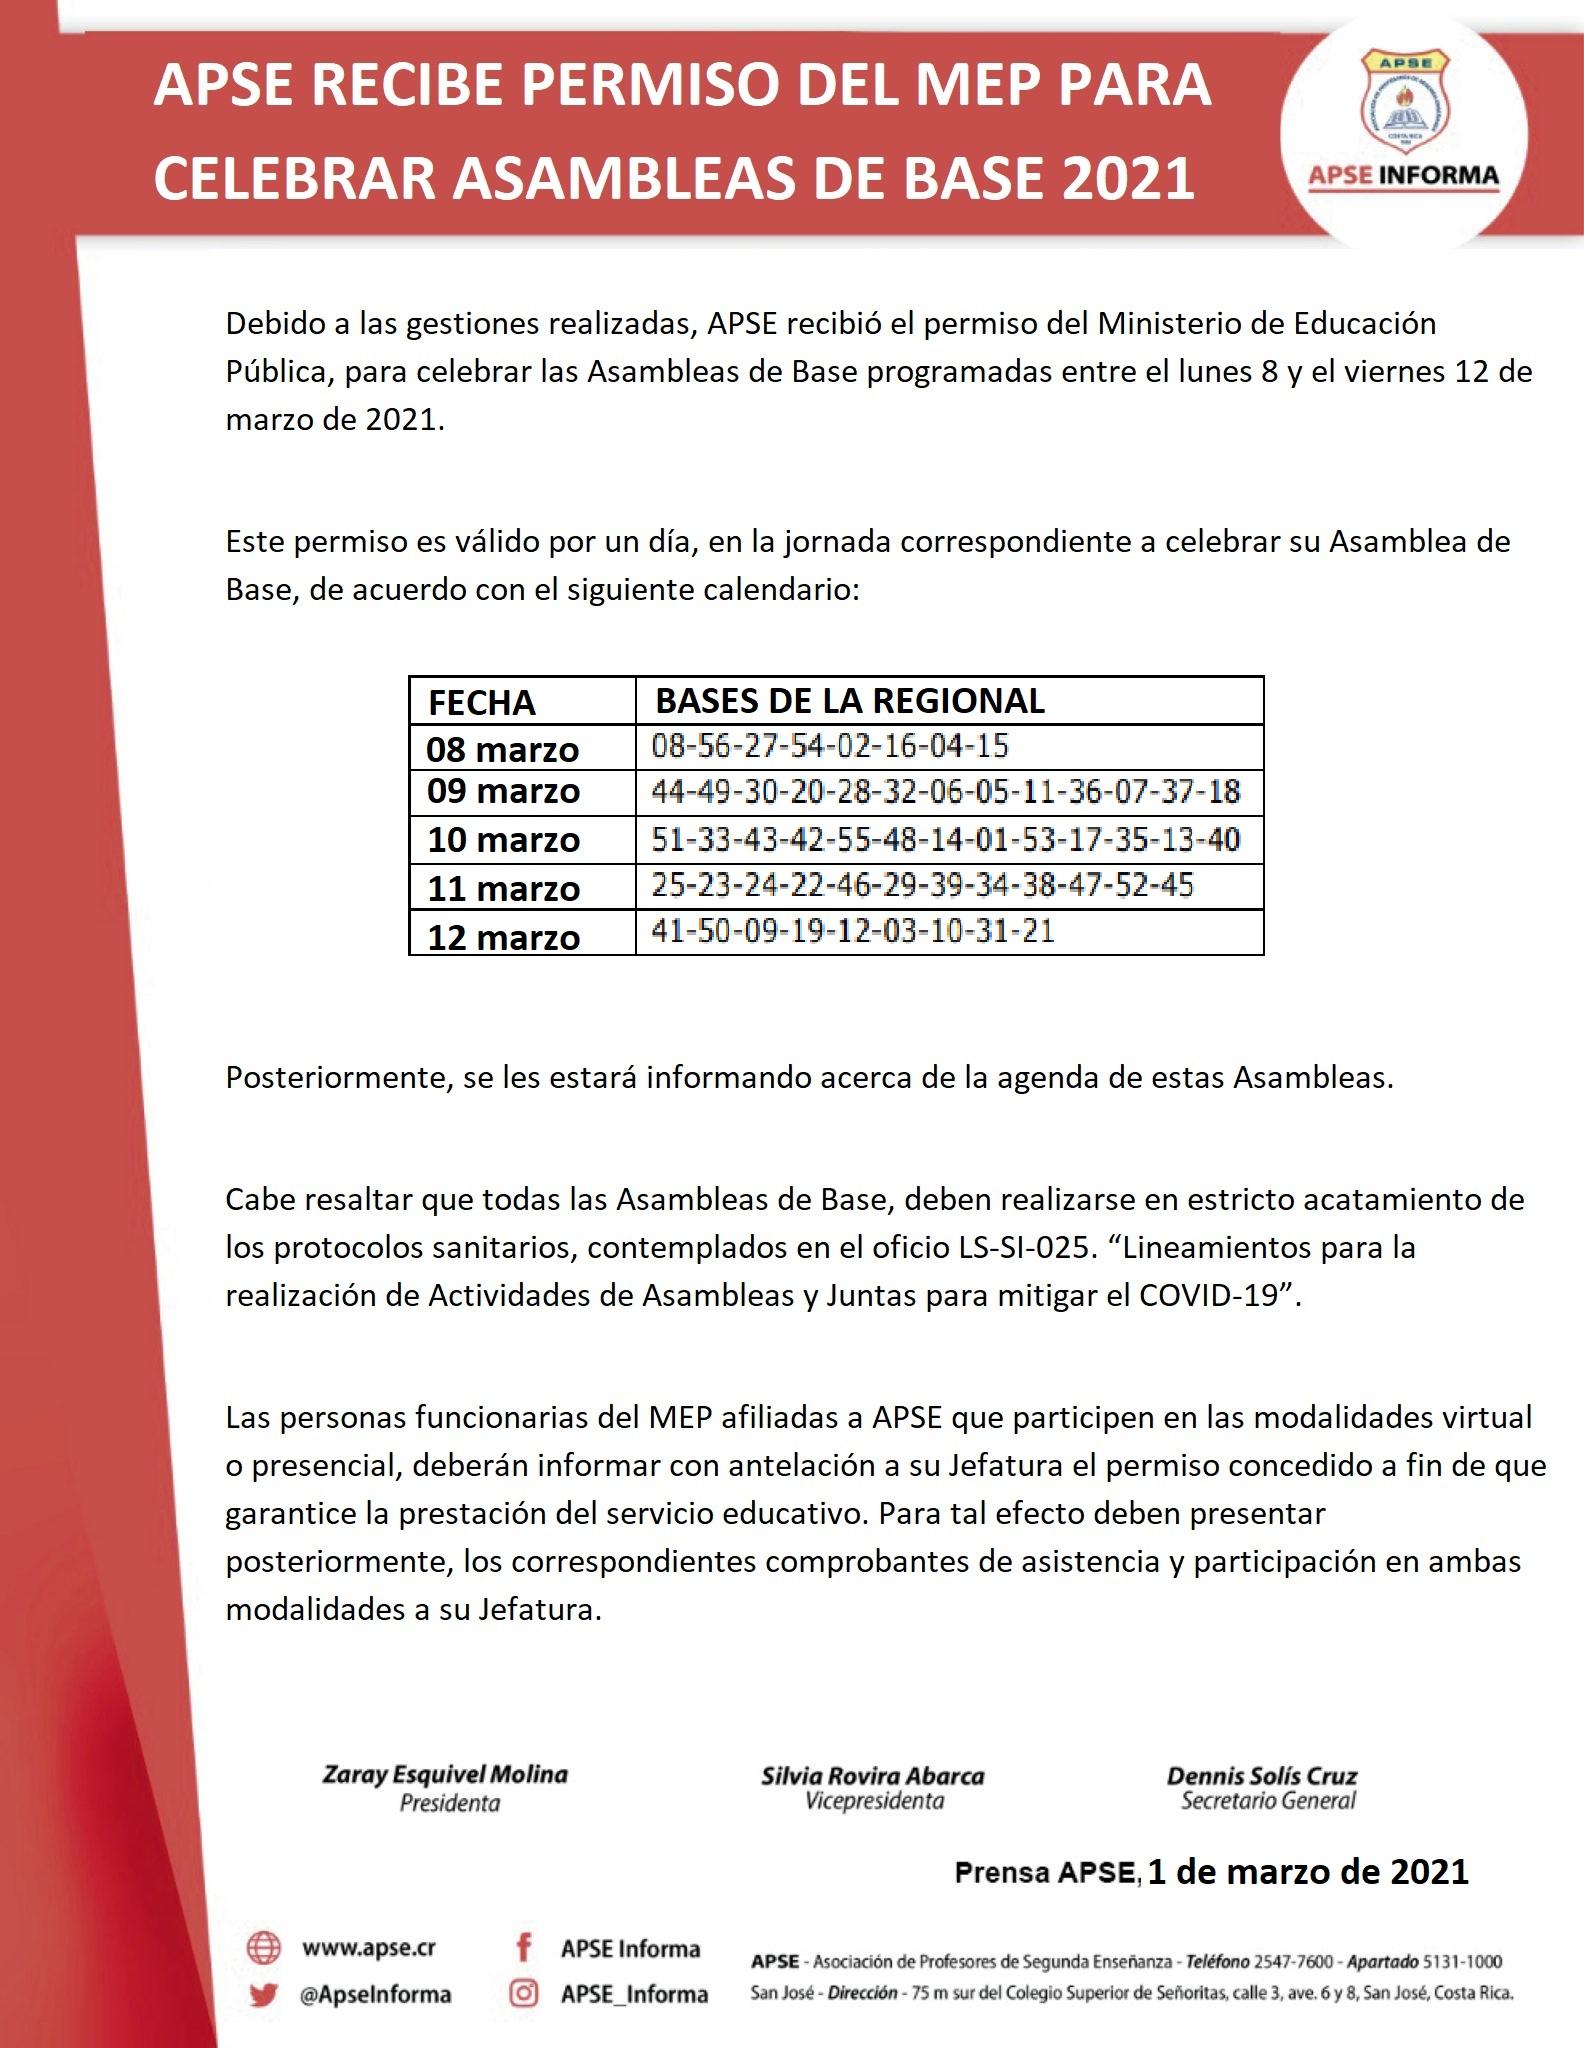 APSE RECIBE PERMISO DEL MEP PARA CELEBRAR ASAMBLEAS DE BASE 2021